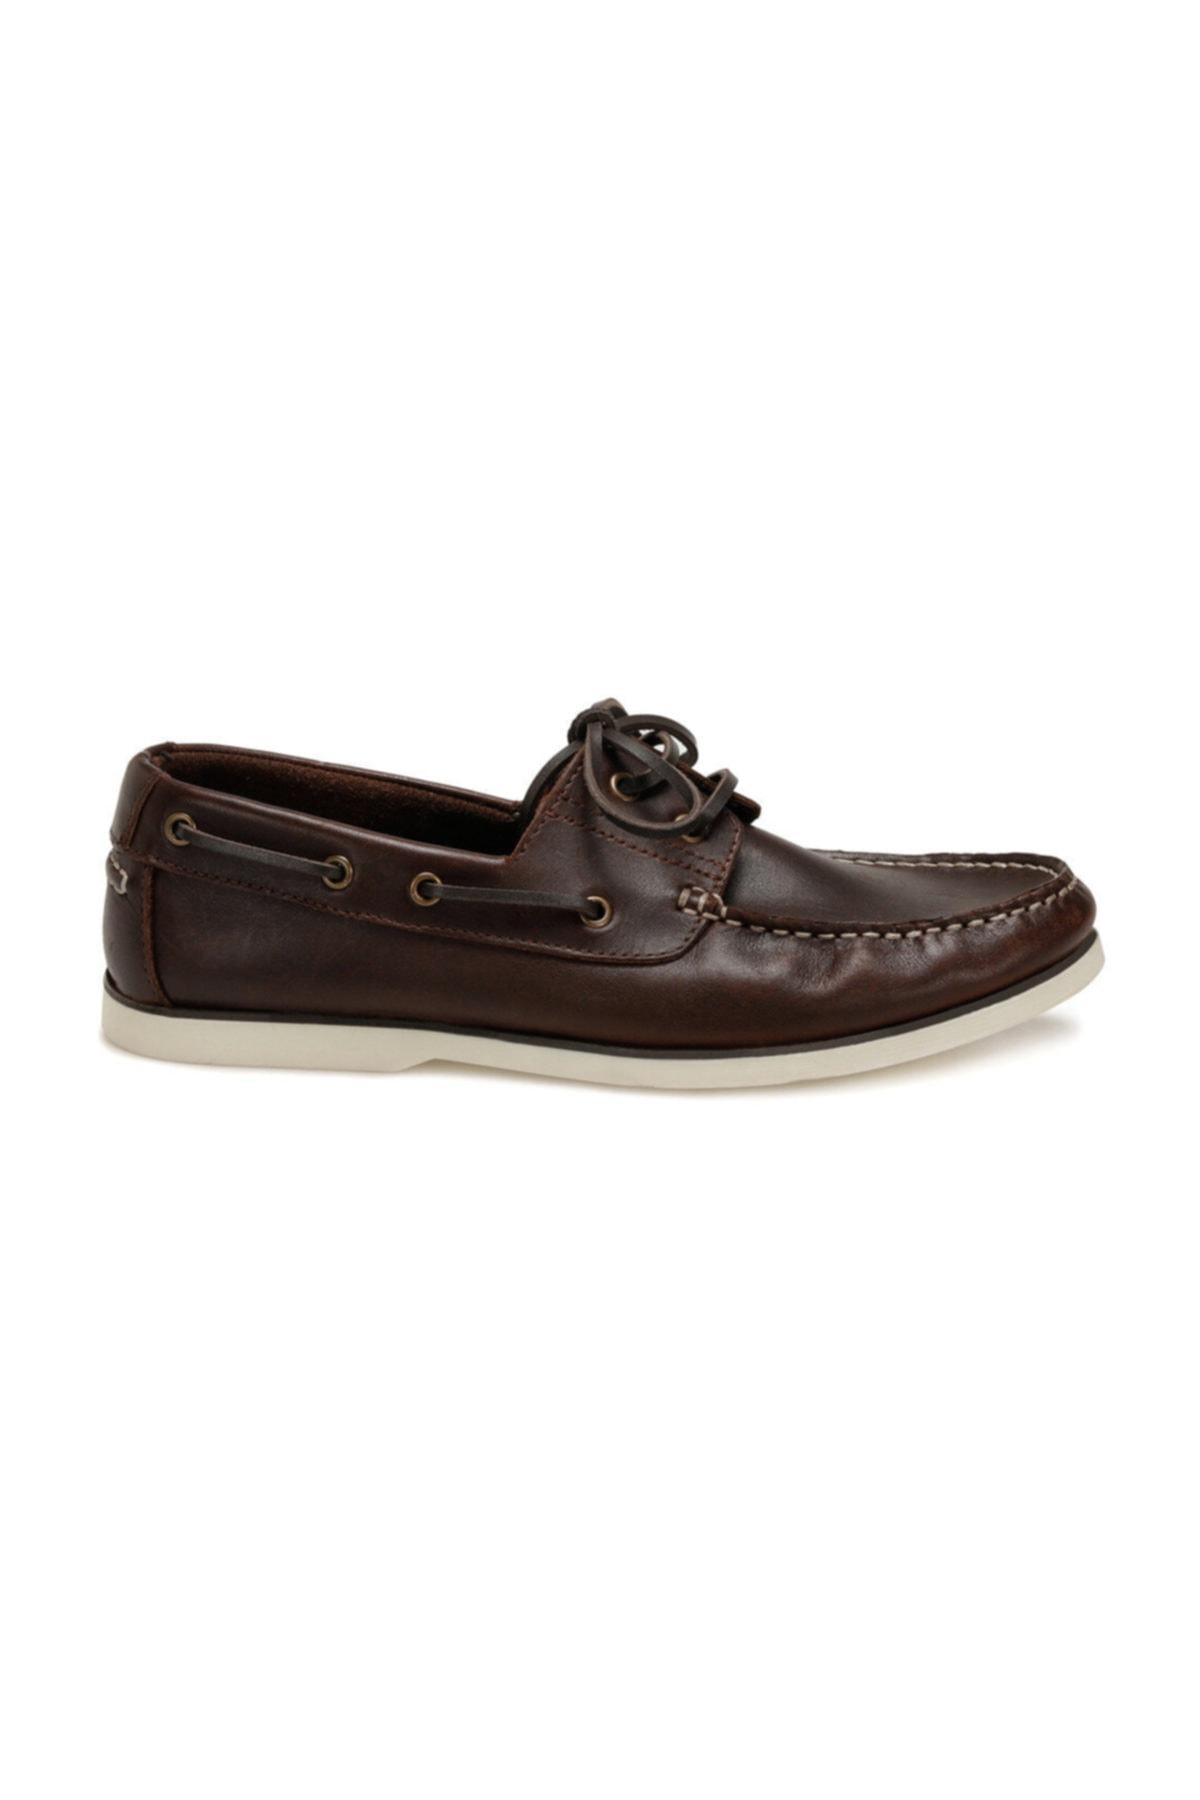 OXIDE MRB81 Kahverengi Erkek Ayakkabı 100518294 2